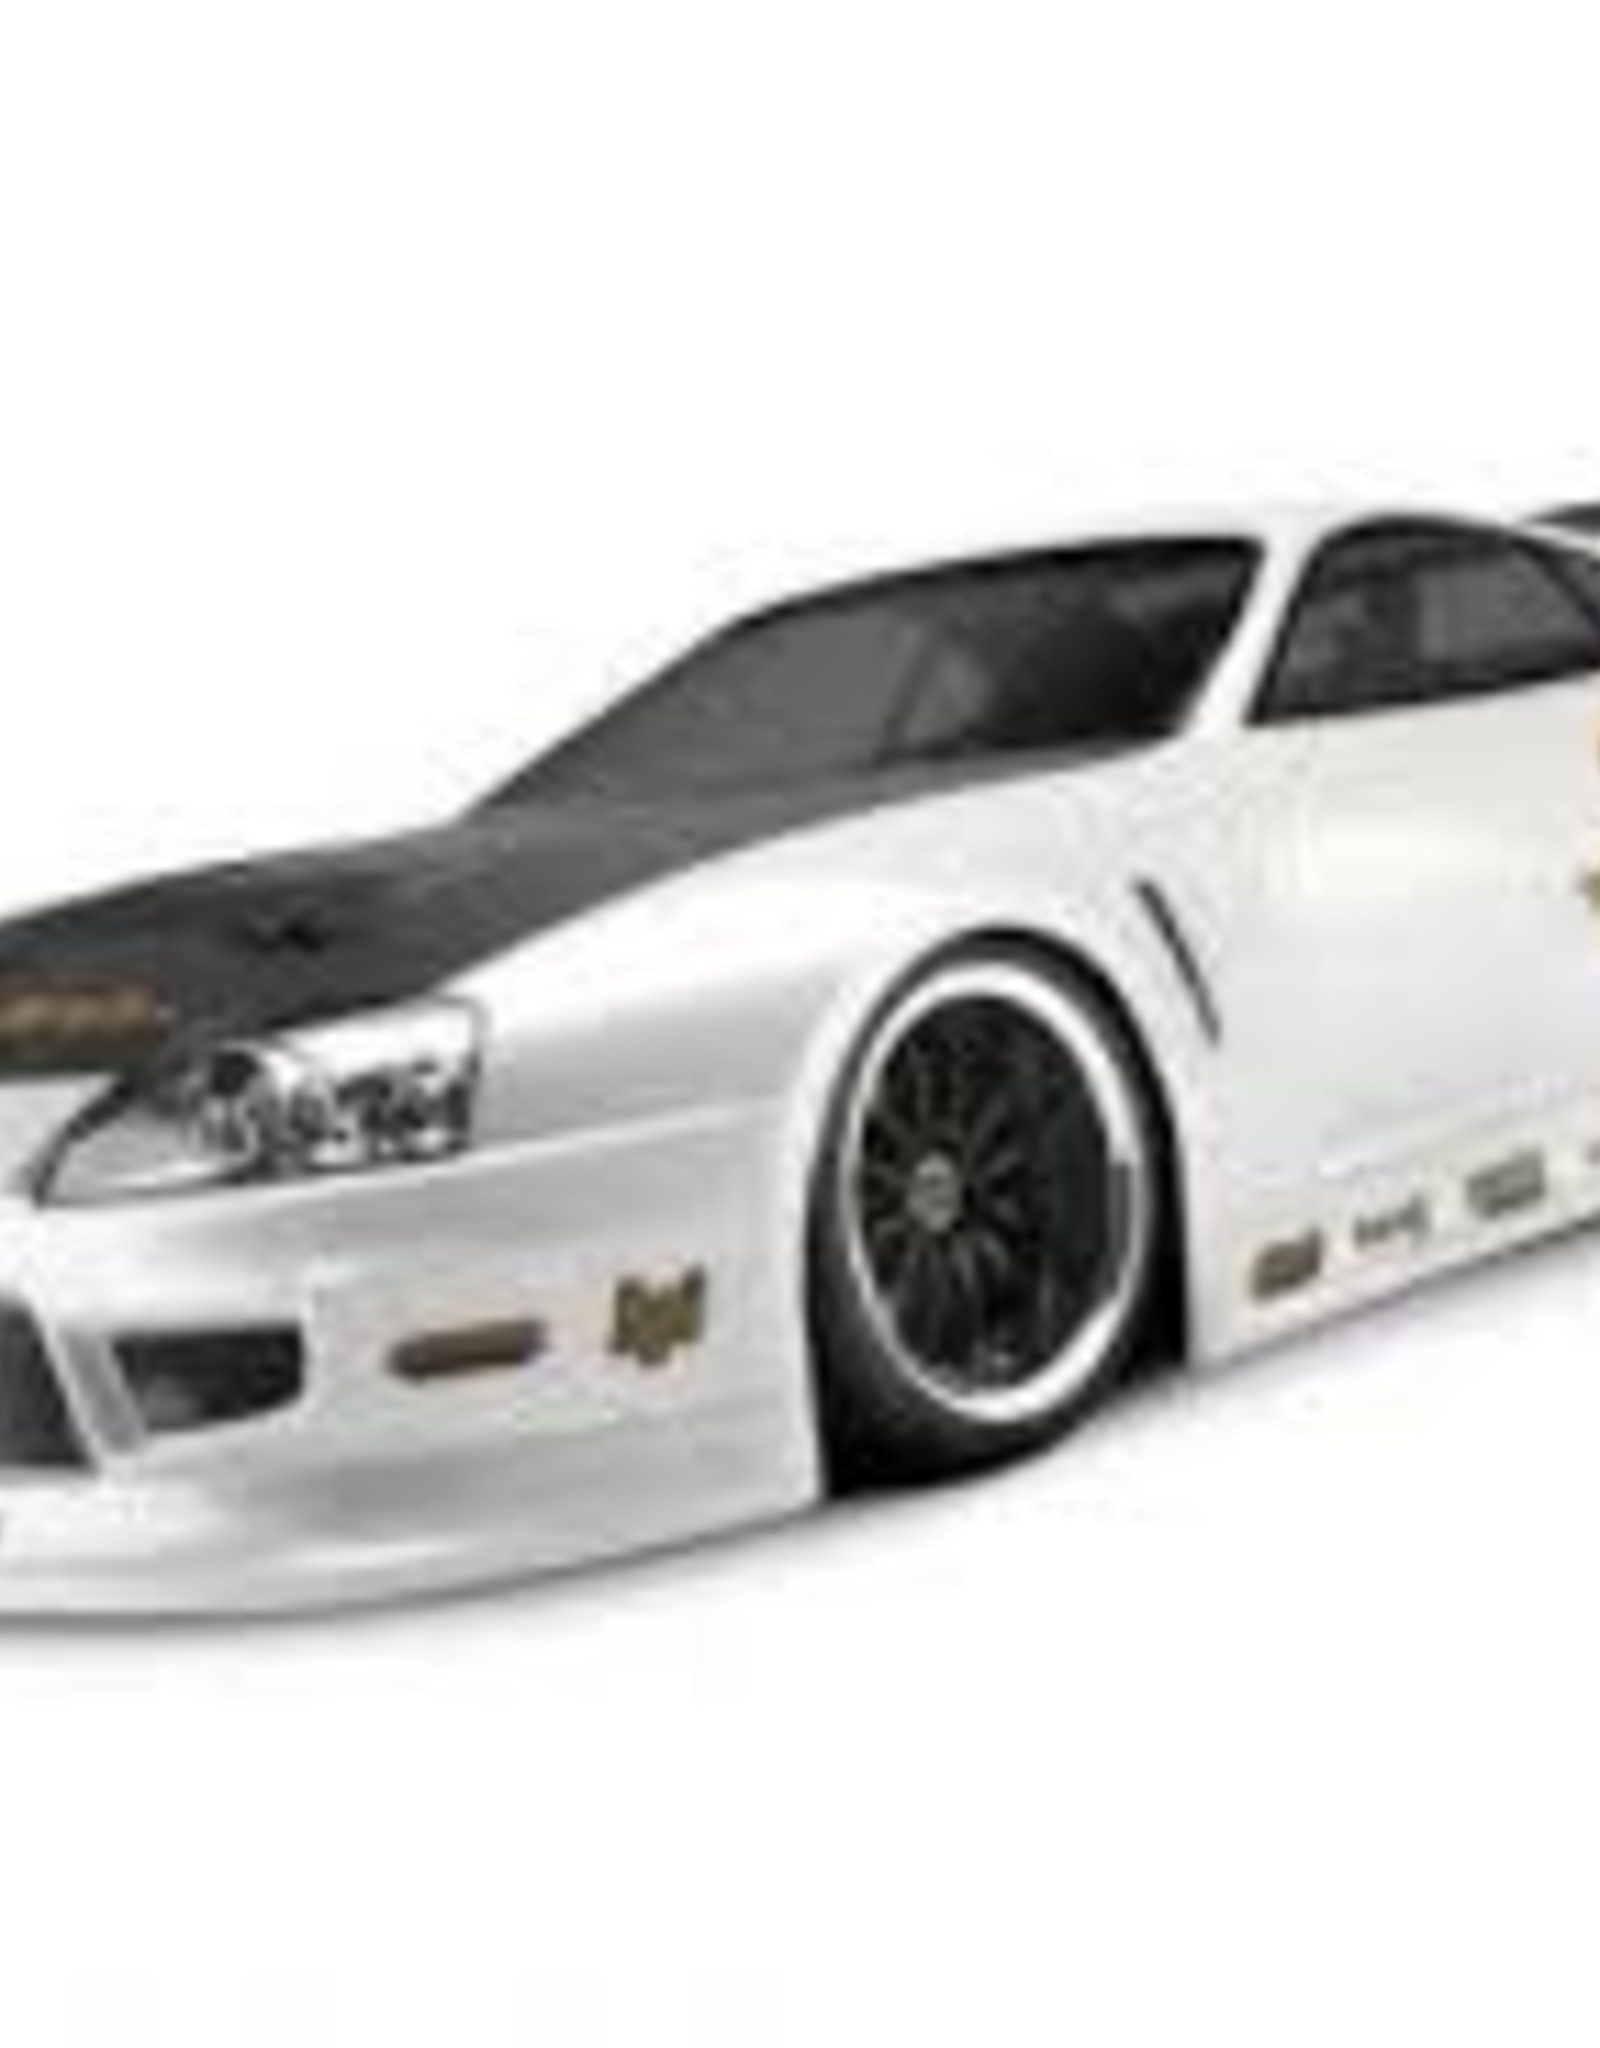 HPI Toyota Supra Aero Body, 200mm